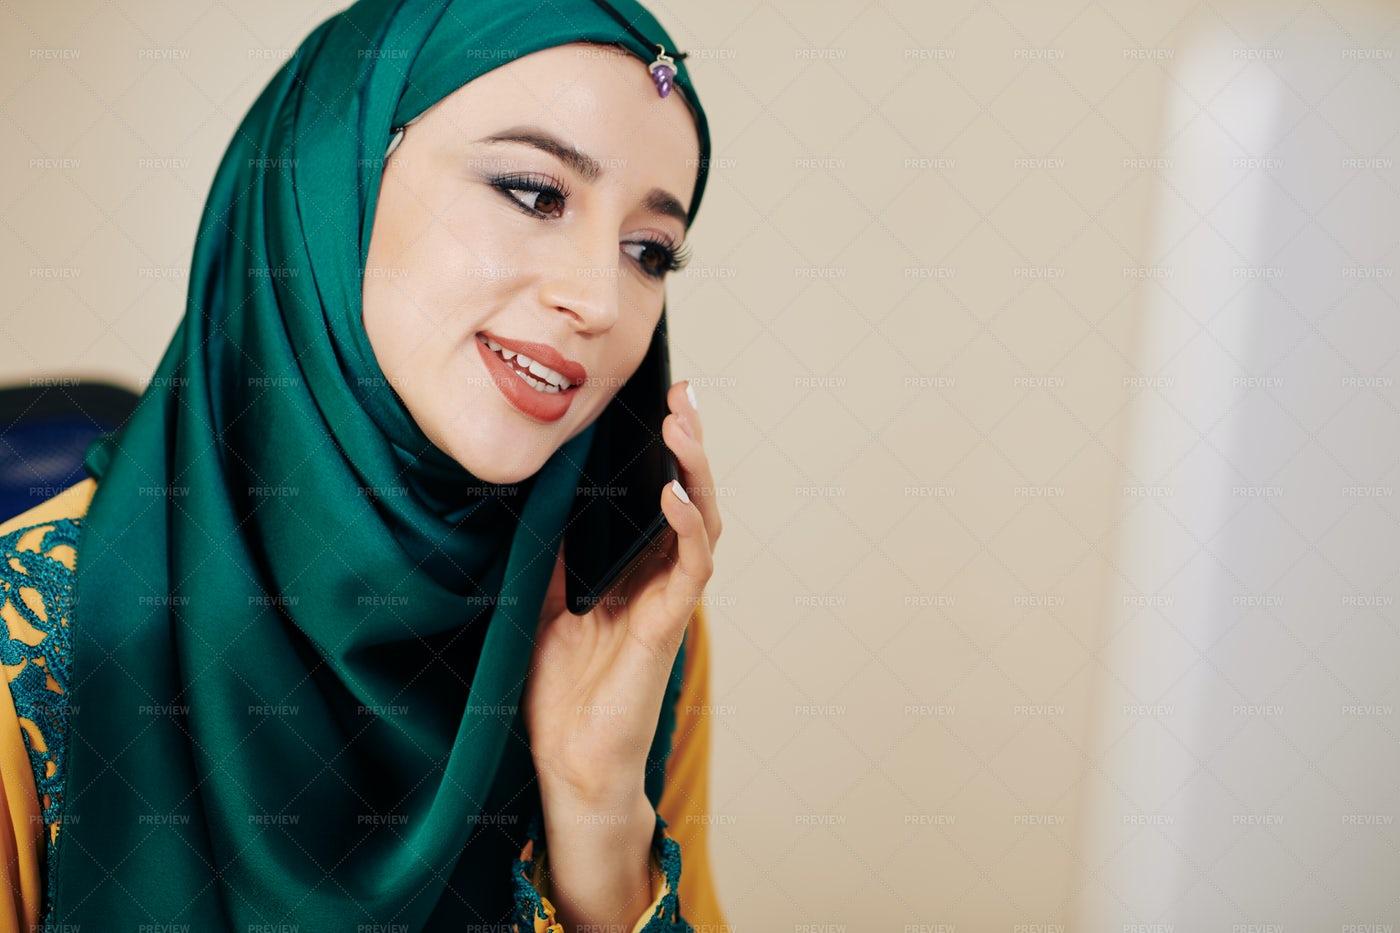 Woman Making Phone Call: Stock Photos